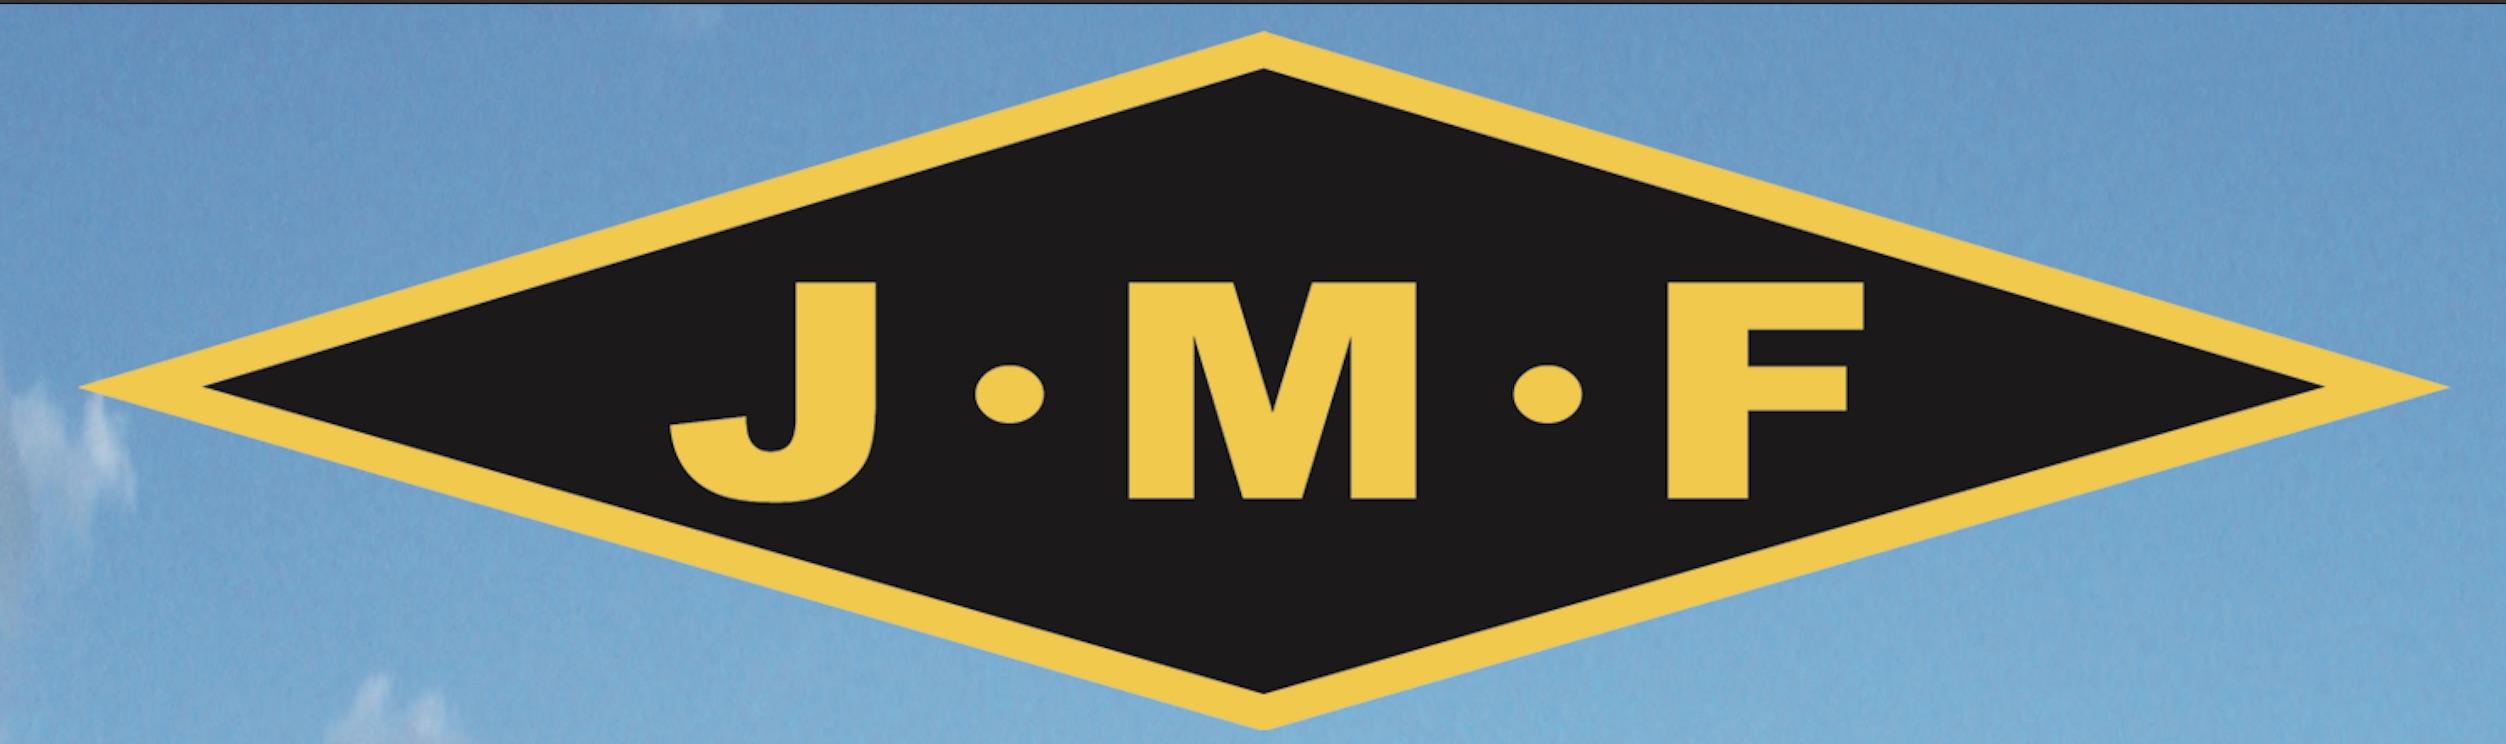 JMF Services